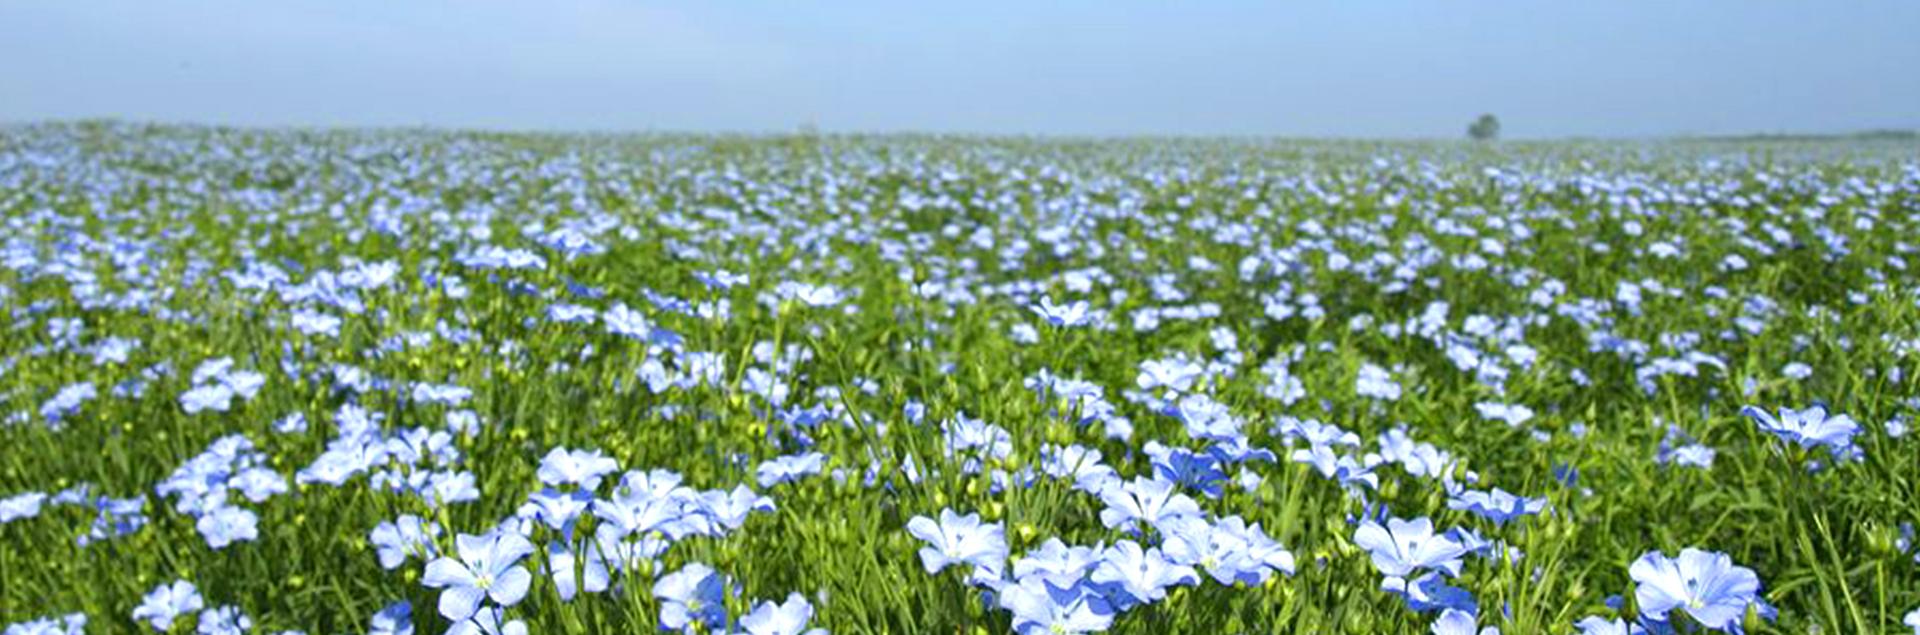 flax-farm0